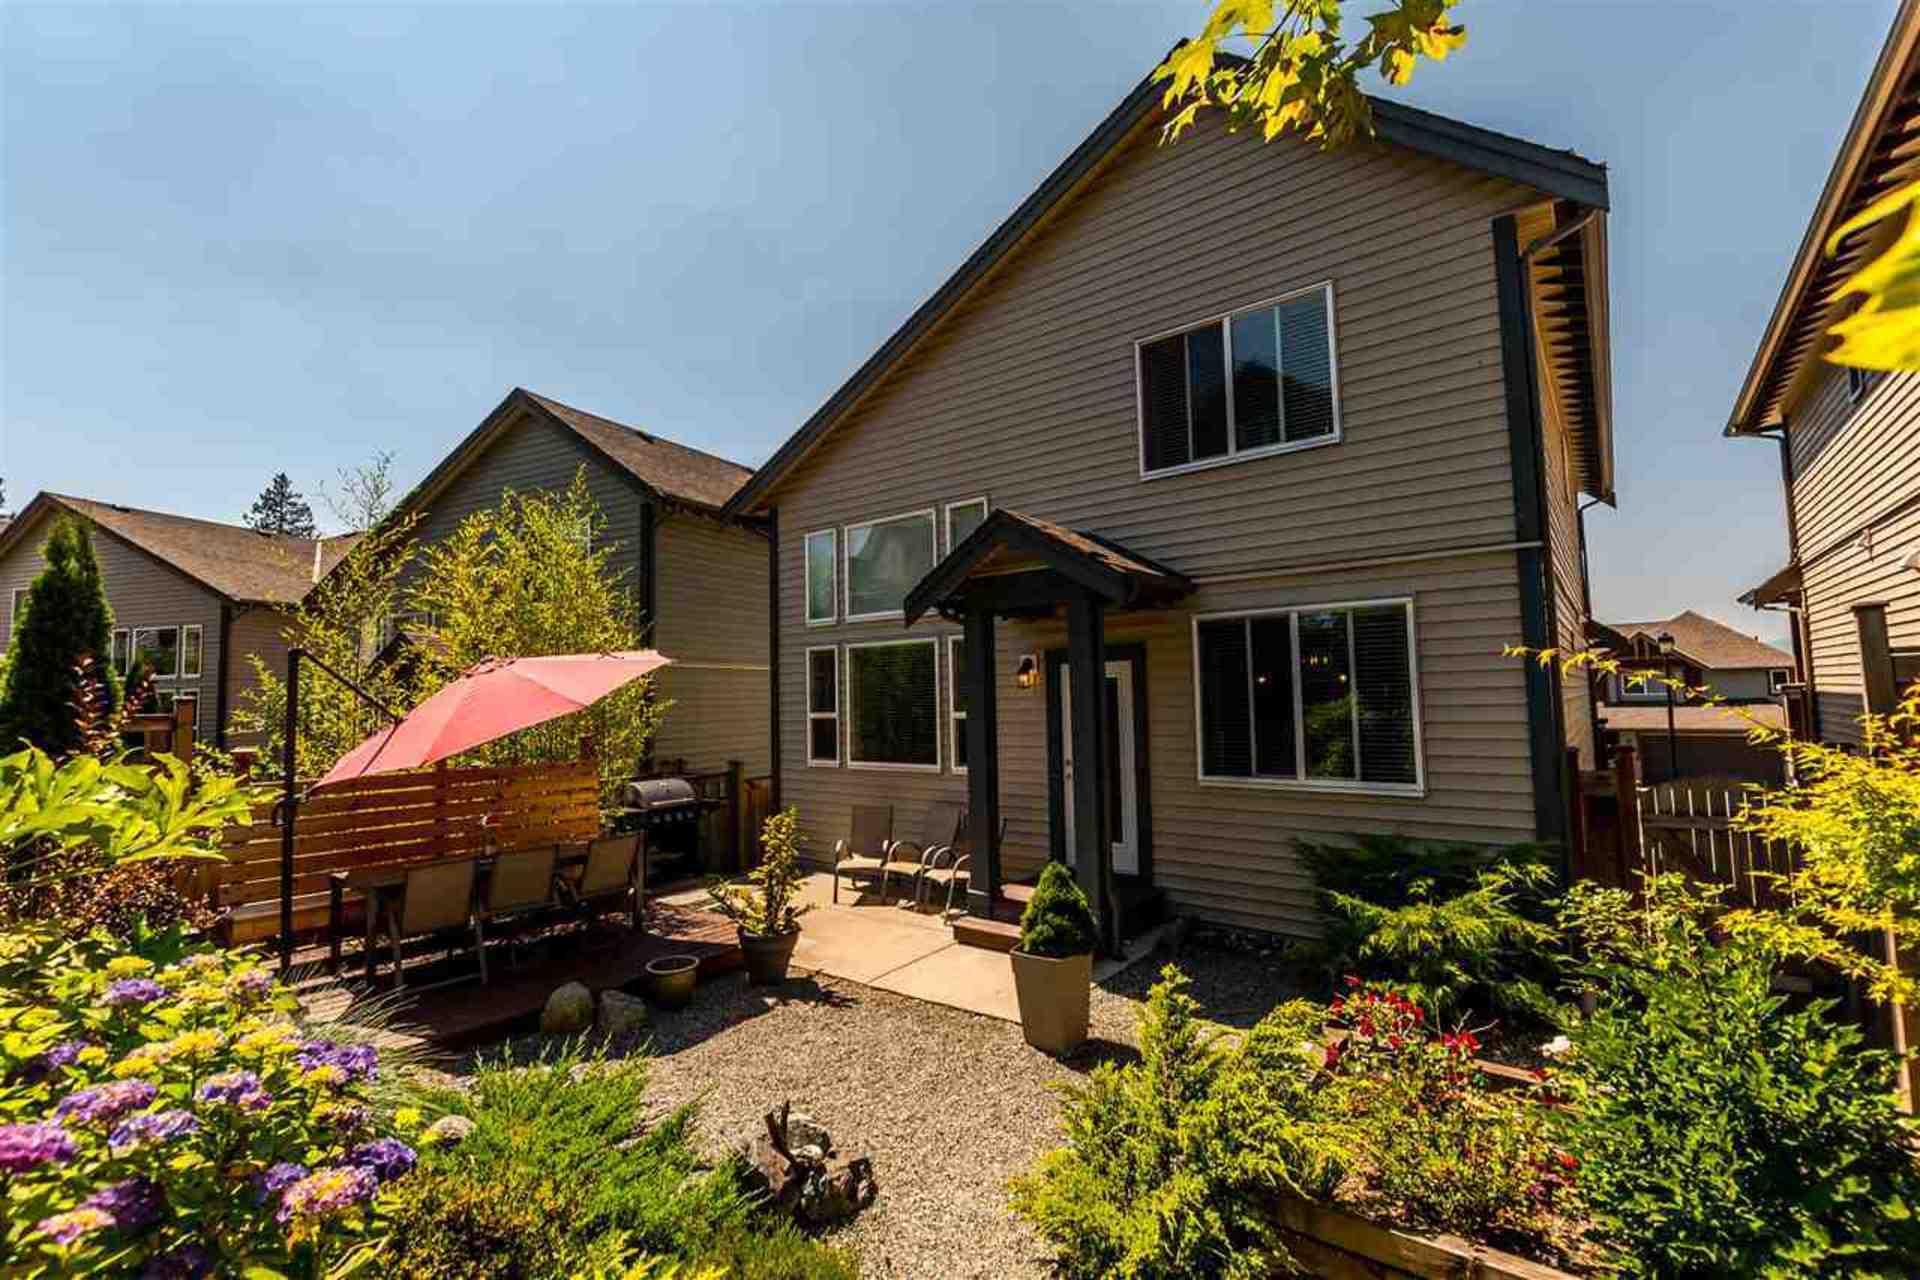 22910-gilbert-drive-silver-valley-maple-ridge-19 at 22910 Gilbert Drive, Silver Valley, Maple Ridge